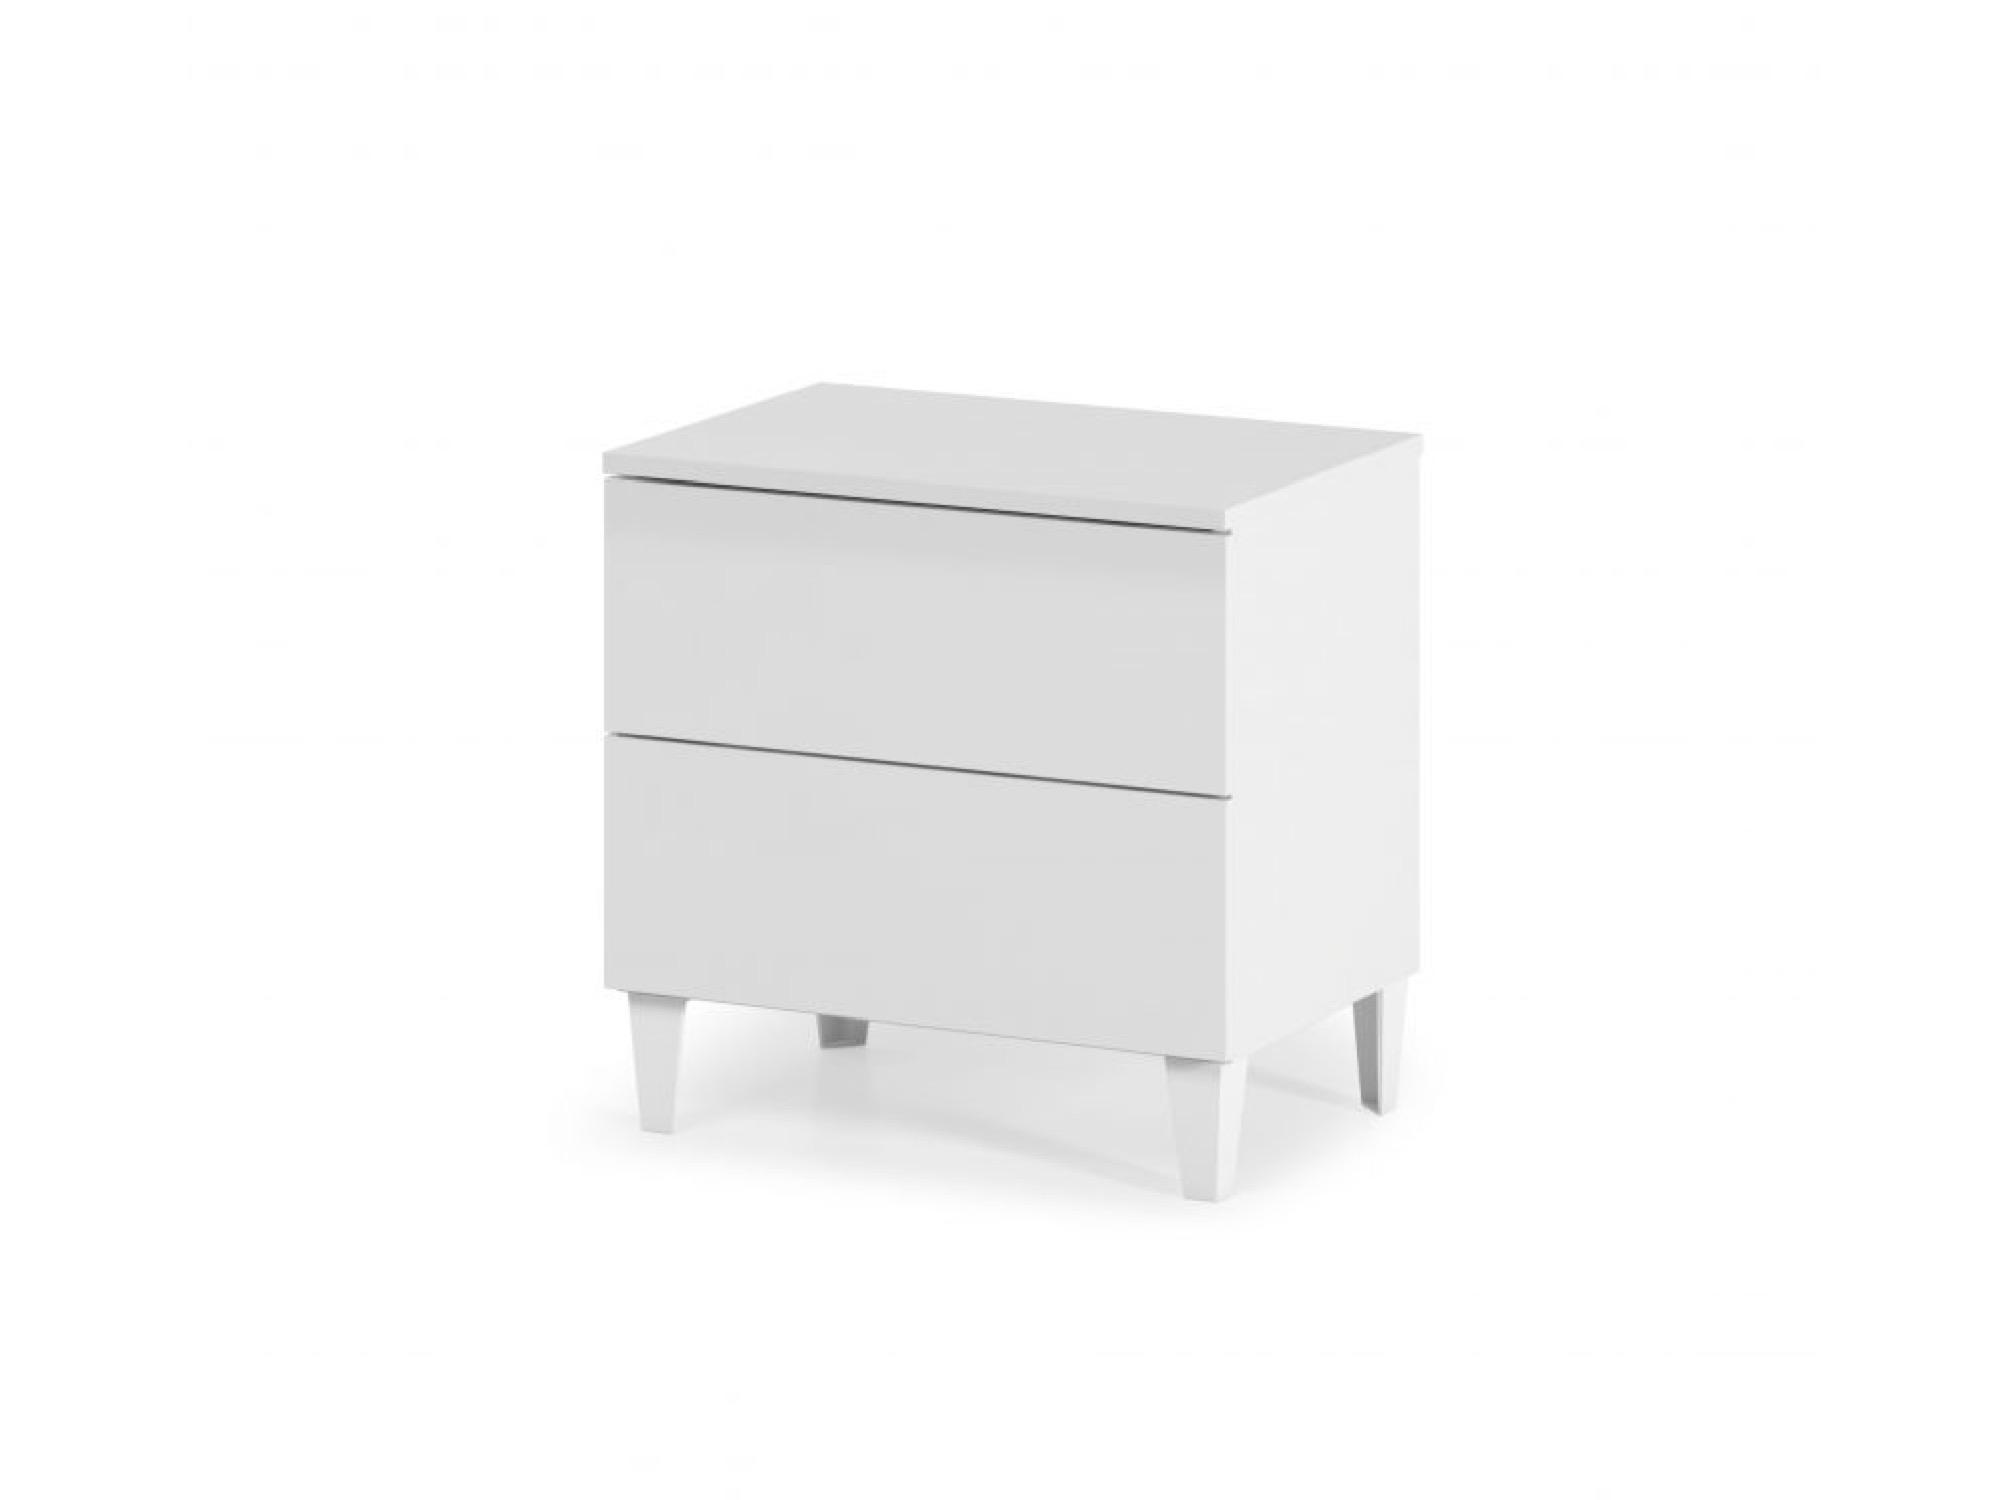 Chevet 2 tiroirs blanc 50x49 (photo)